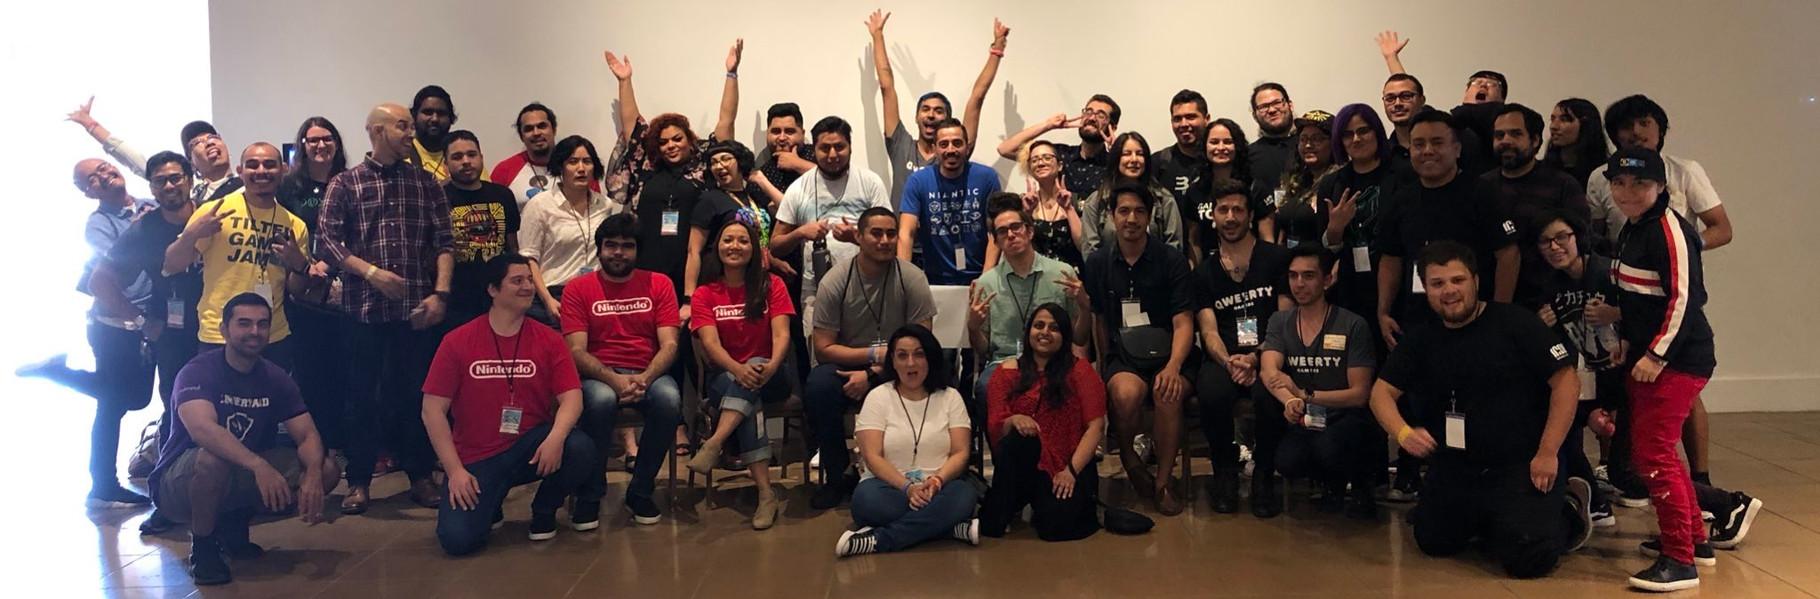 Latinx Games Festival organizers, volunteers, sponsors, and panelists